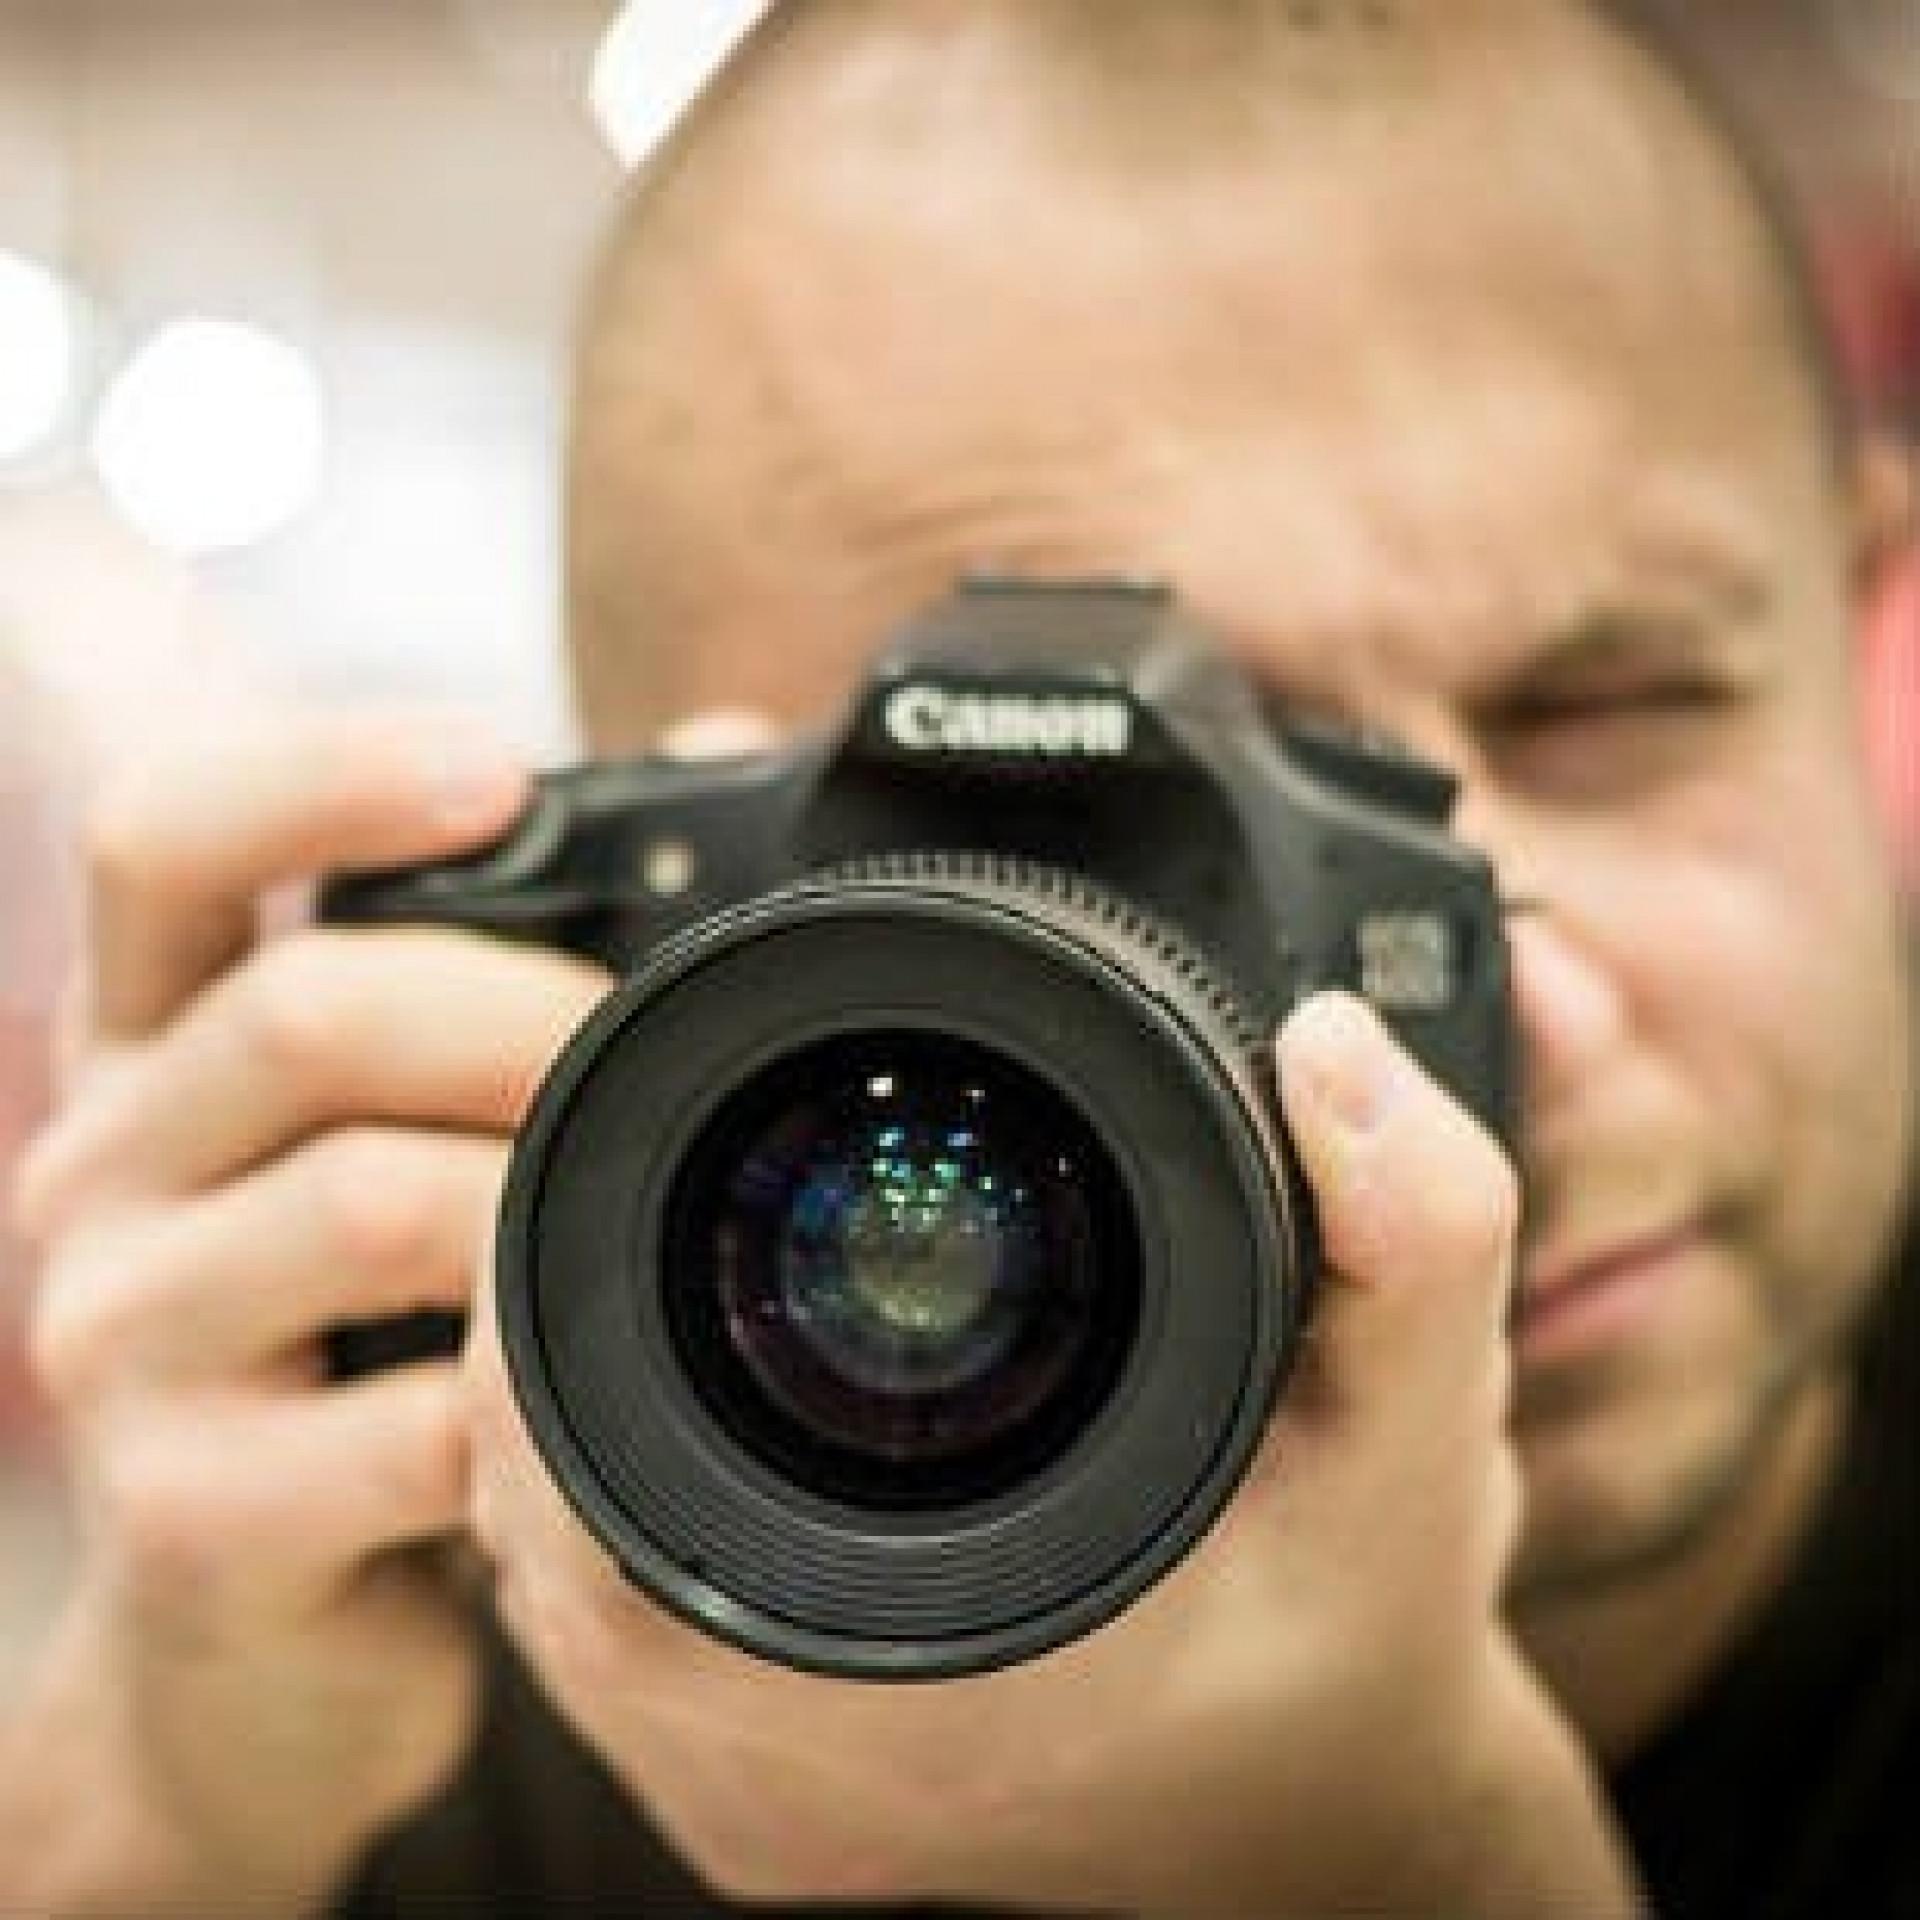 Devenir photographe professionnel : bien choisir sa formation